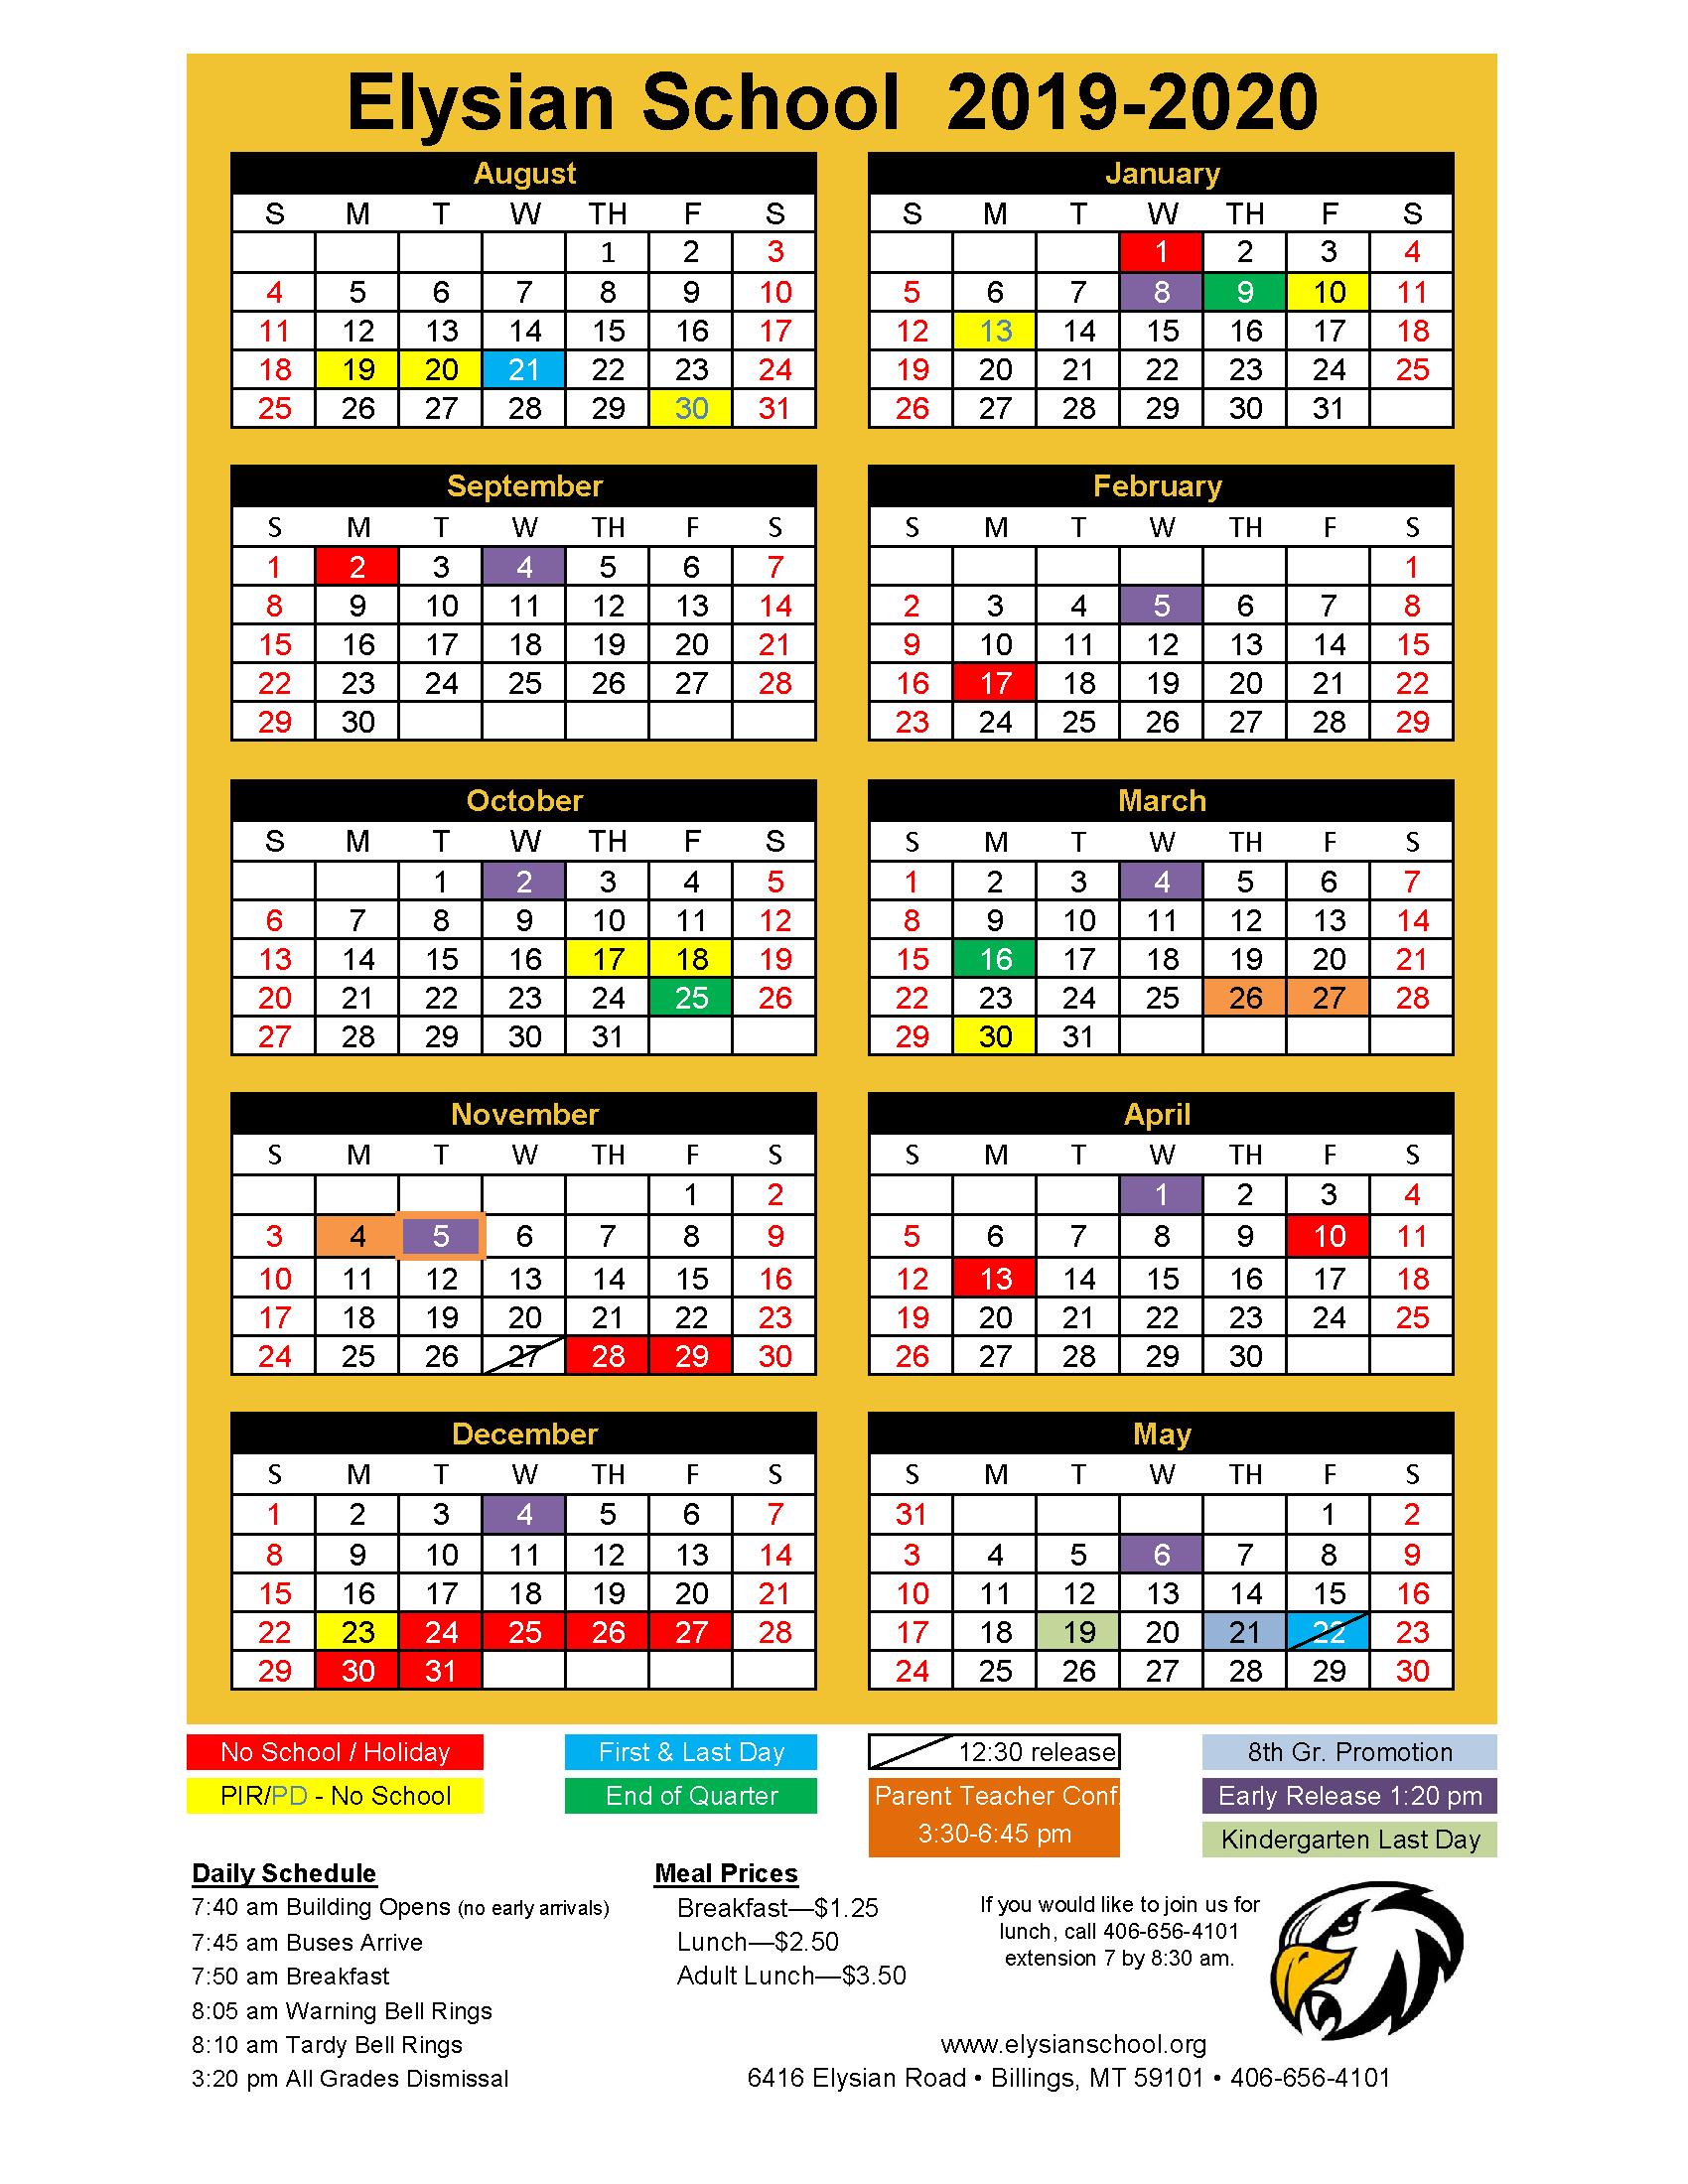 Chamberlain University Academic Schedule | Printable Pertaining To University Of Minnesota Christmas Break 2021